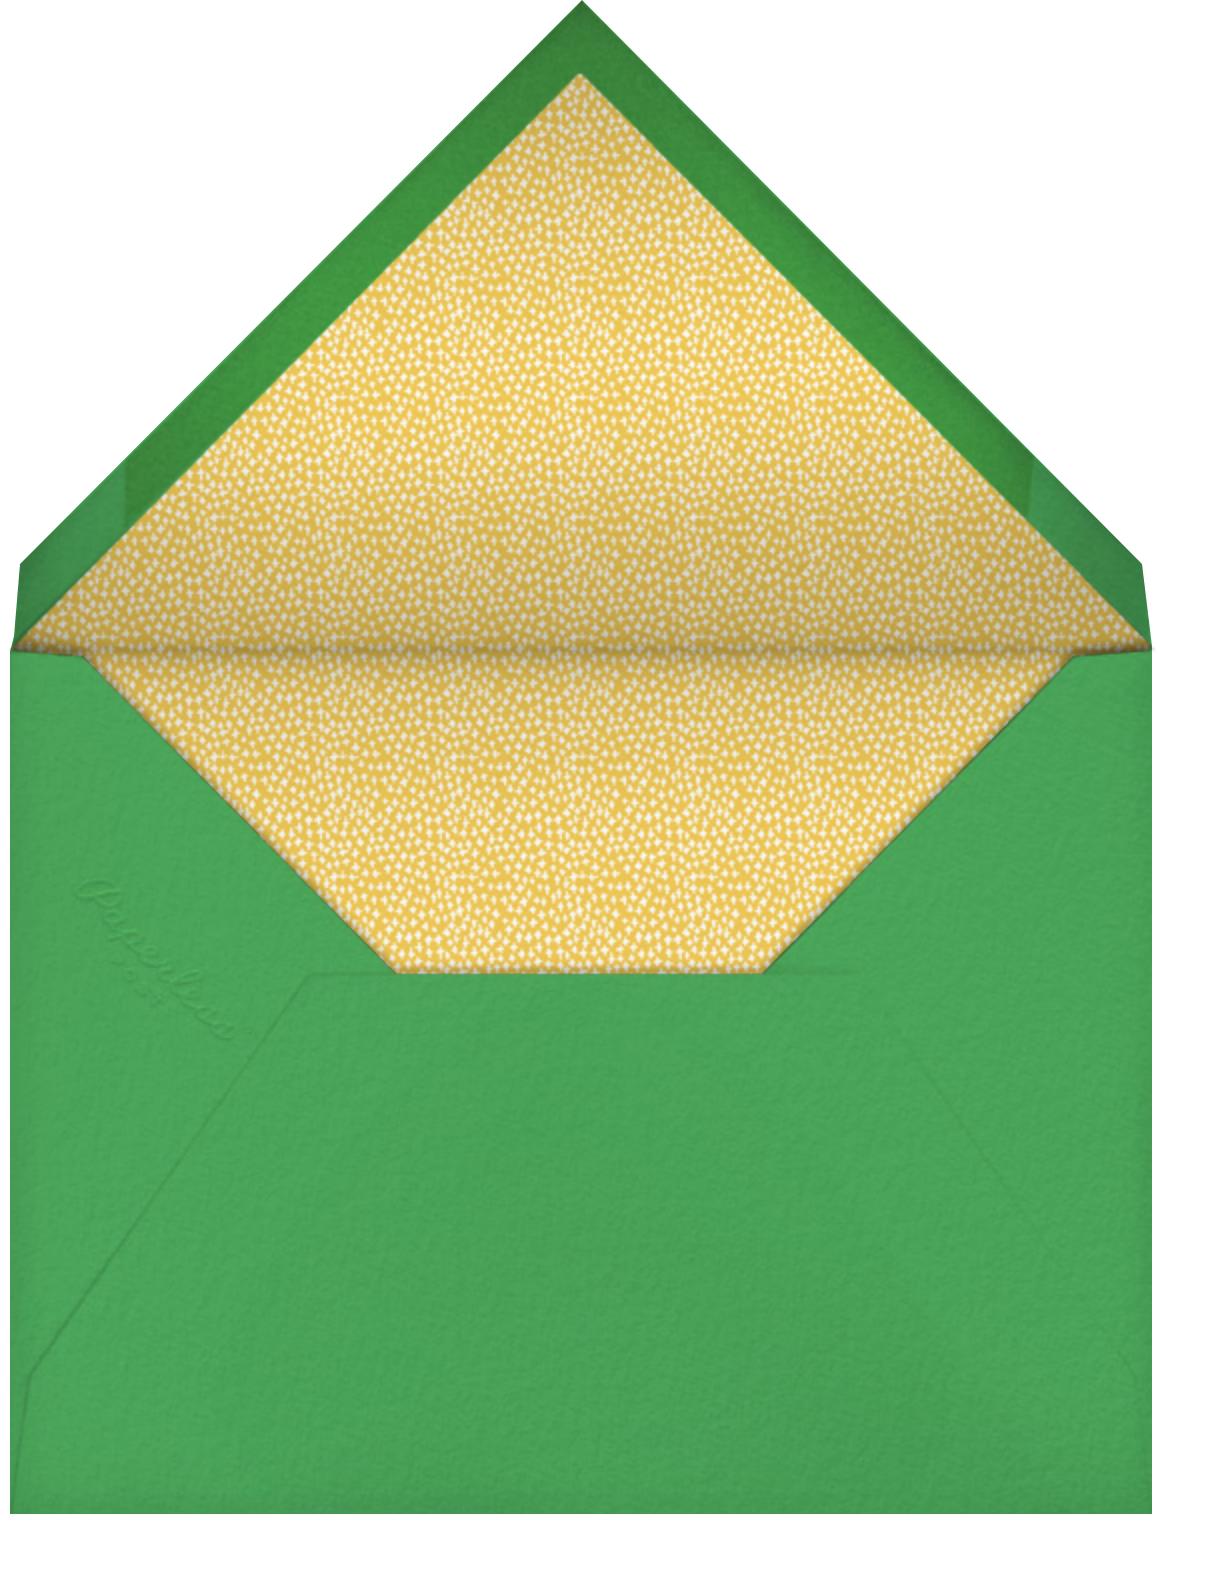 Bench Buds - Mr. Boddington's Studio - Love and romance - envelope back